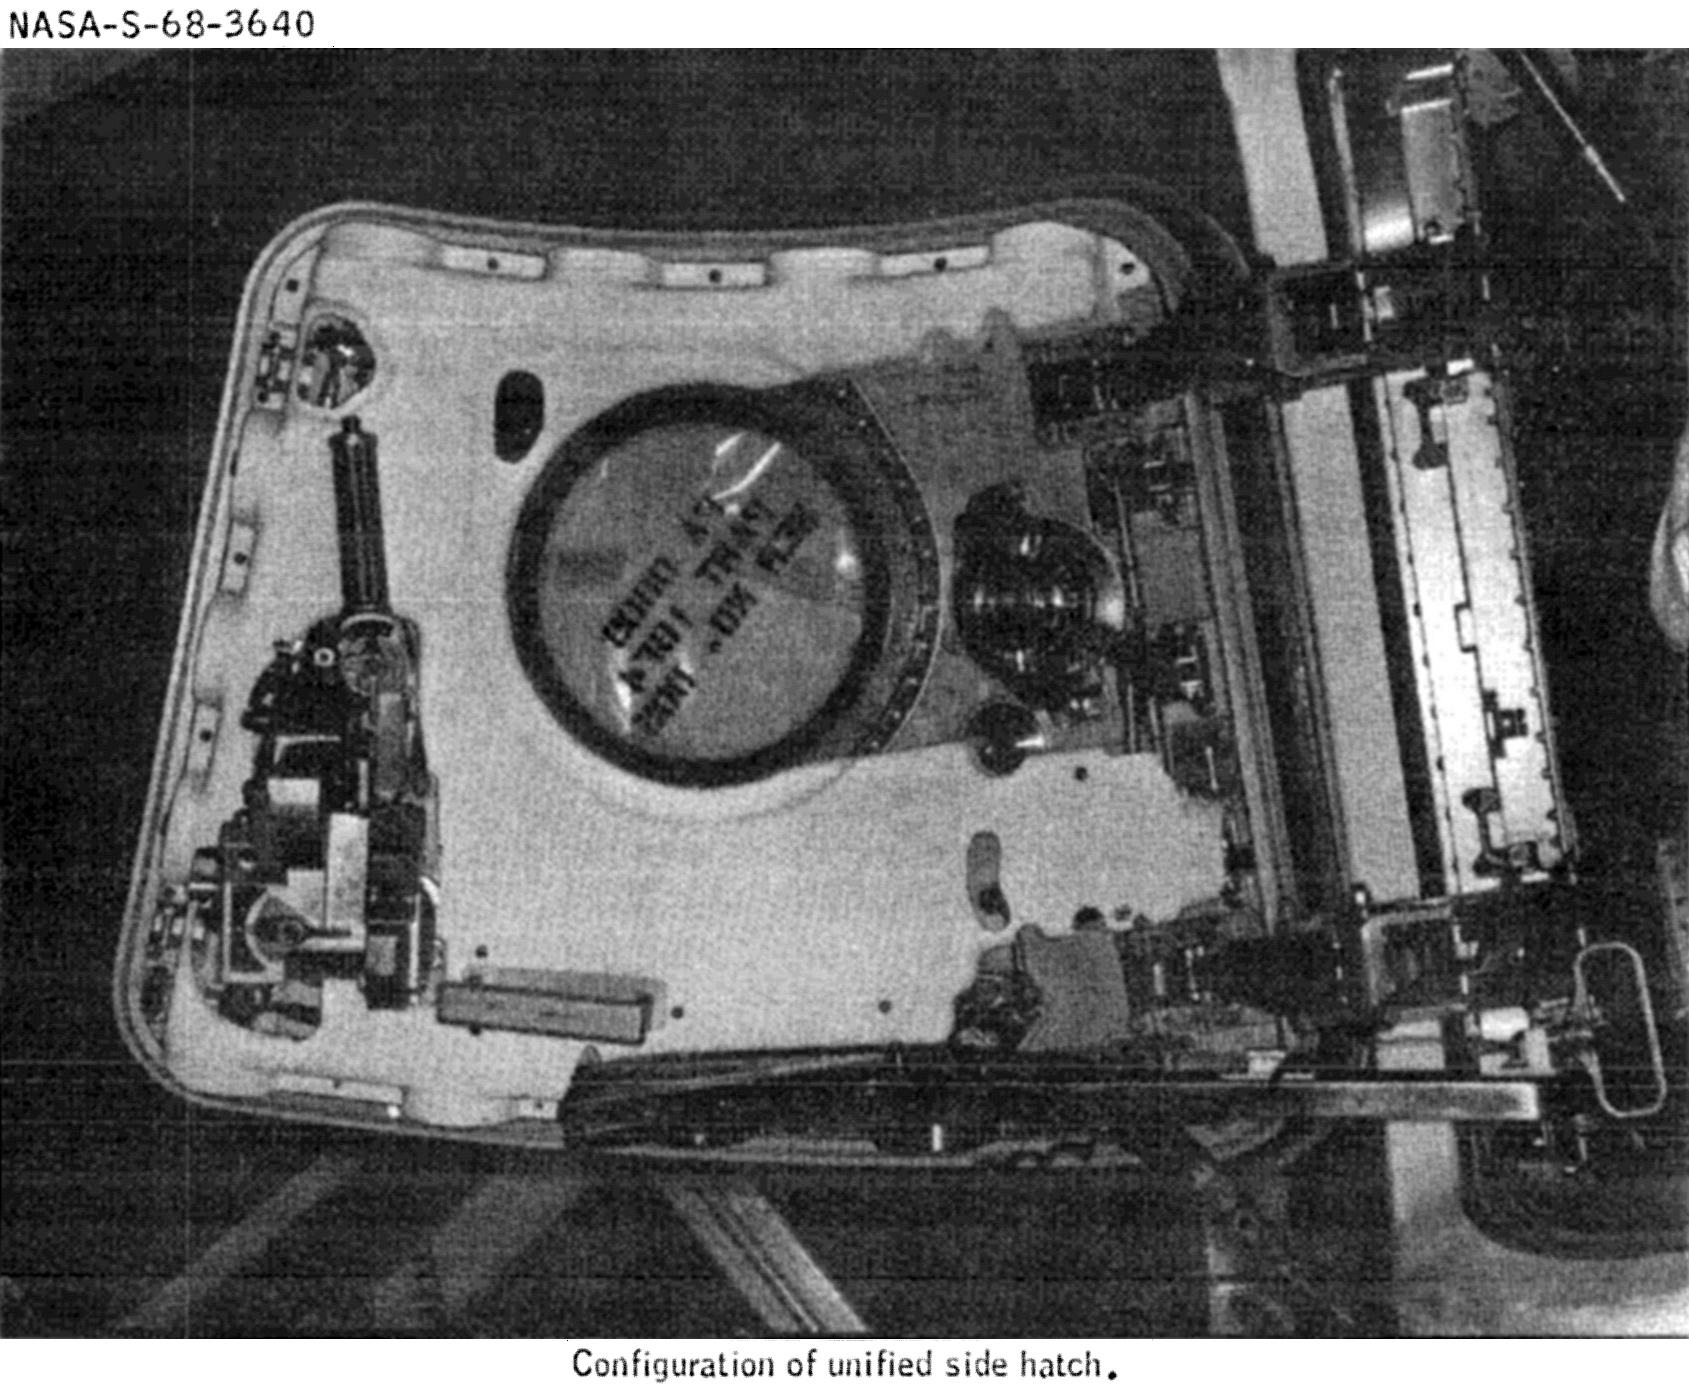 Saturn V AS-502 (Apollo 6) - 4.4.1968 Apollo-6-hatch